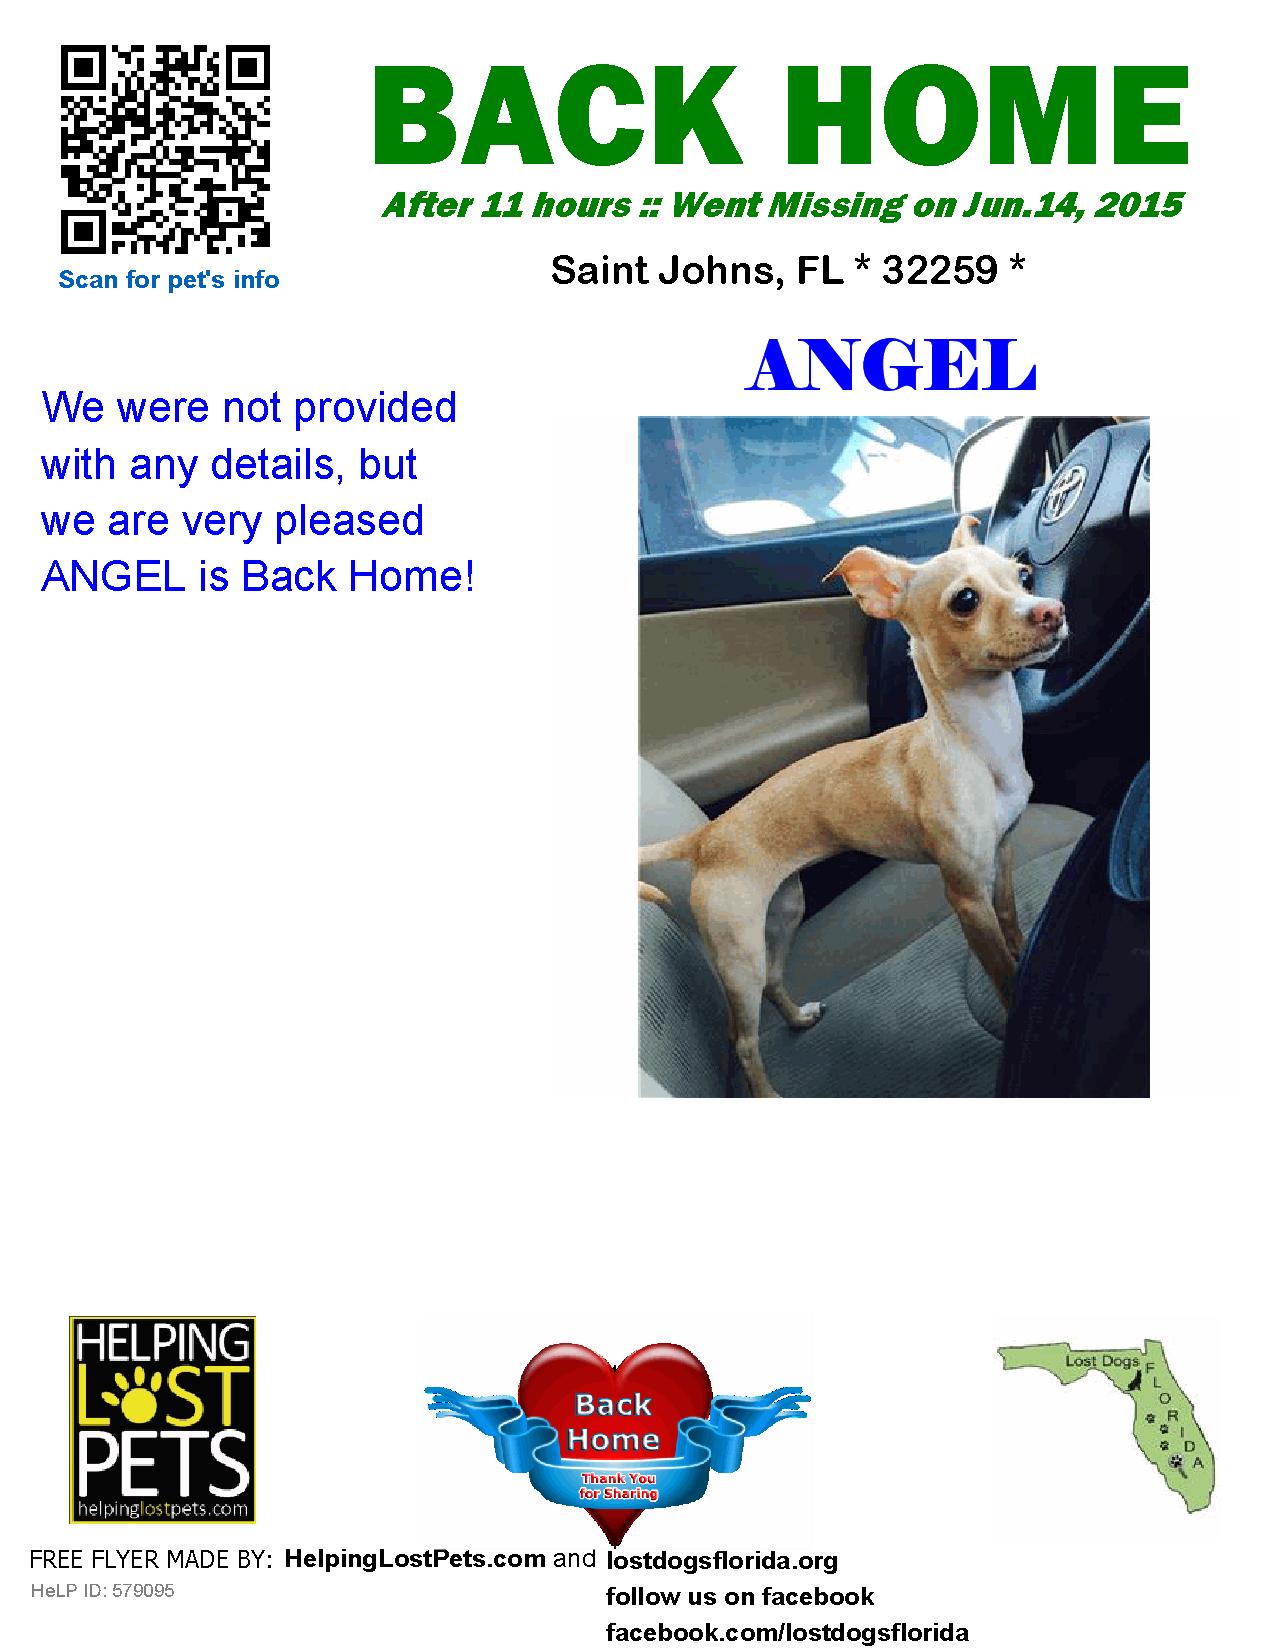 Helping Lost Pets Dog Chihuahua Back Home Losing A Dog